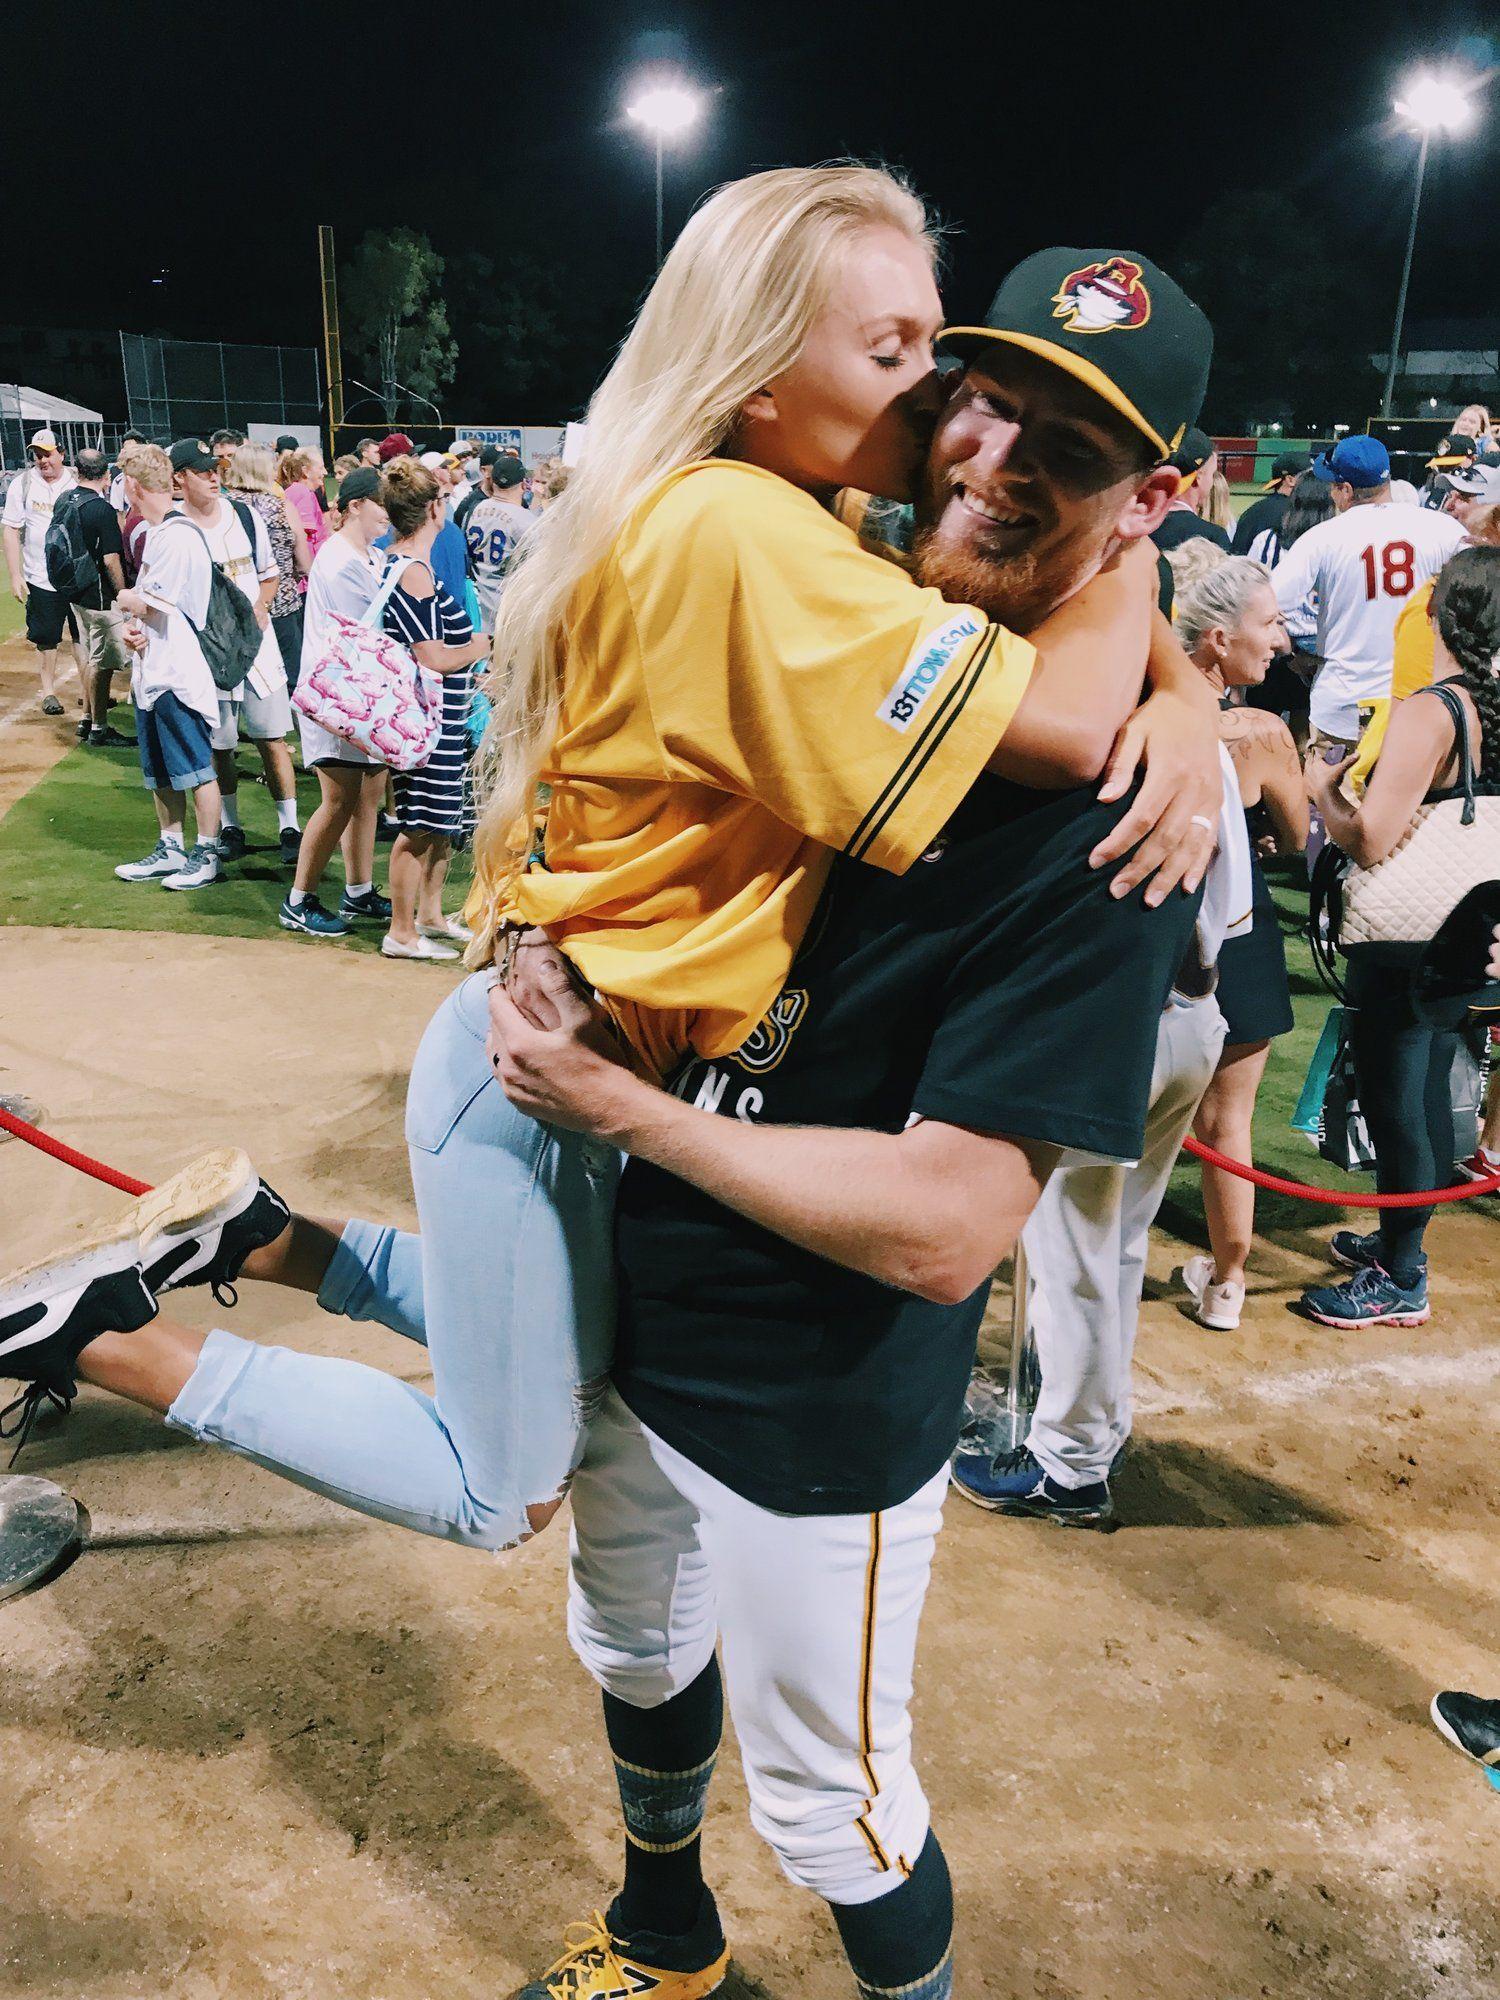 Baseball in australia baseball couples baseball